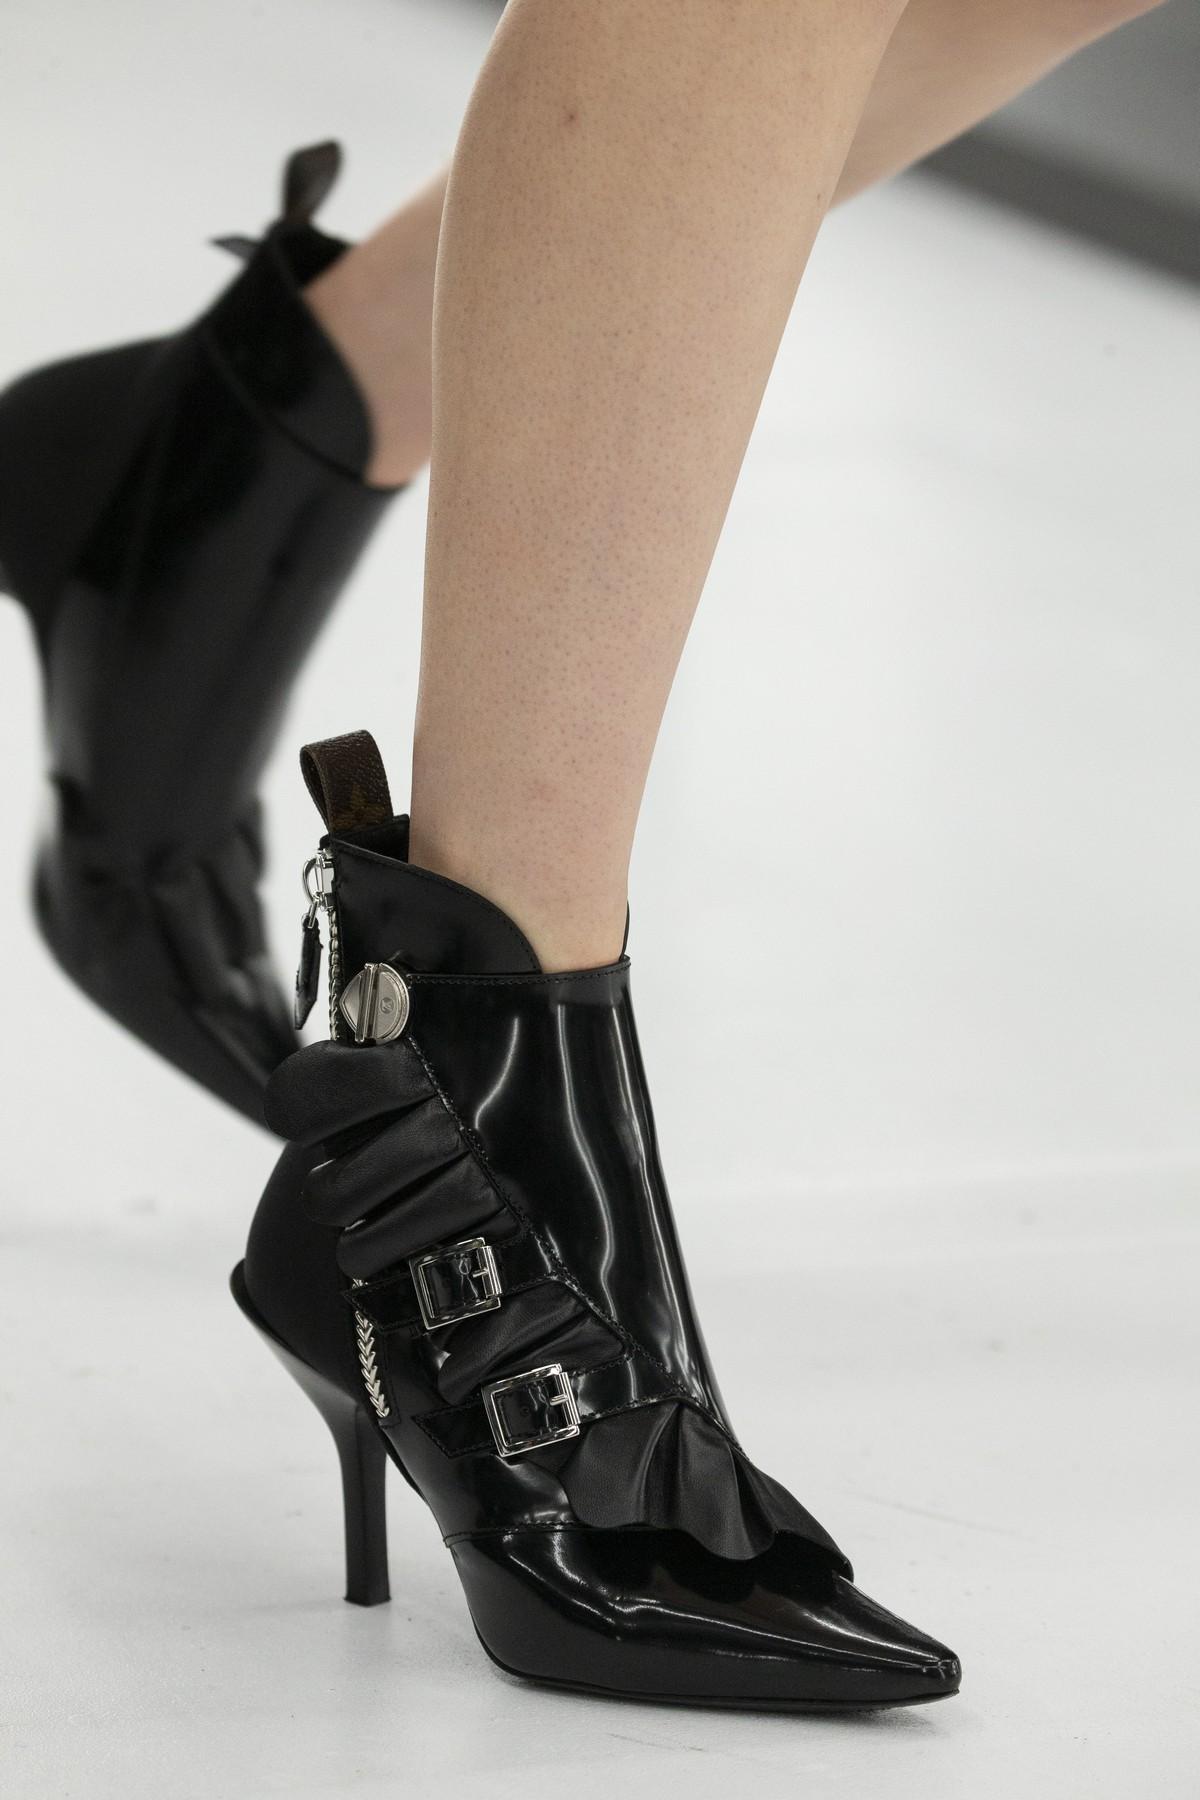 Louis Vuitton donna primavera estate 2019